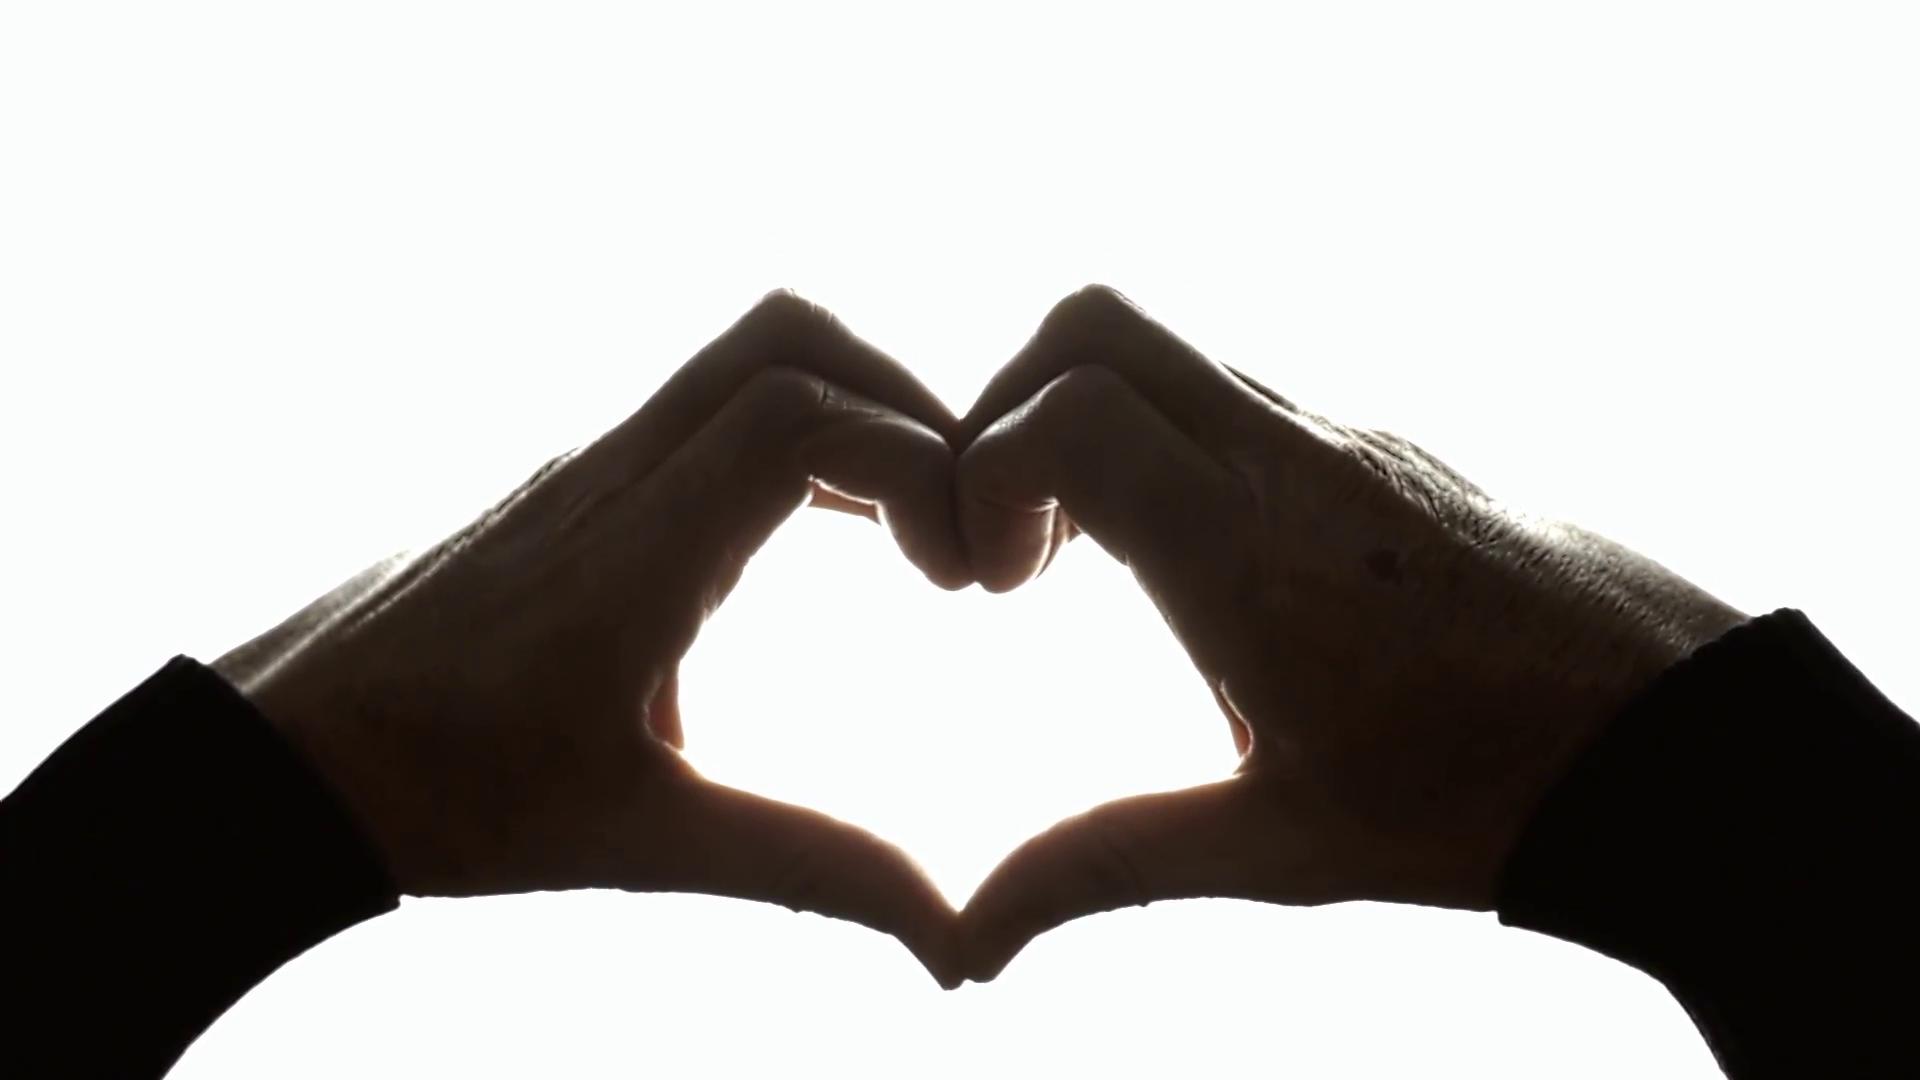 1920x1080 Silhouette Hands Rainbow Flag Heart. Hands Raising Up, Creating